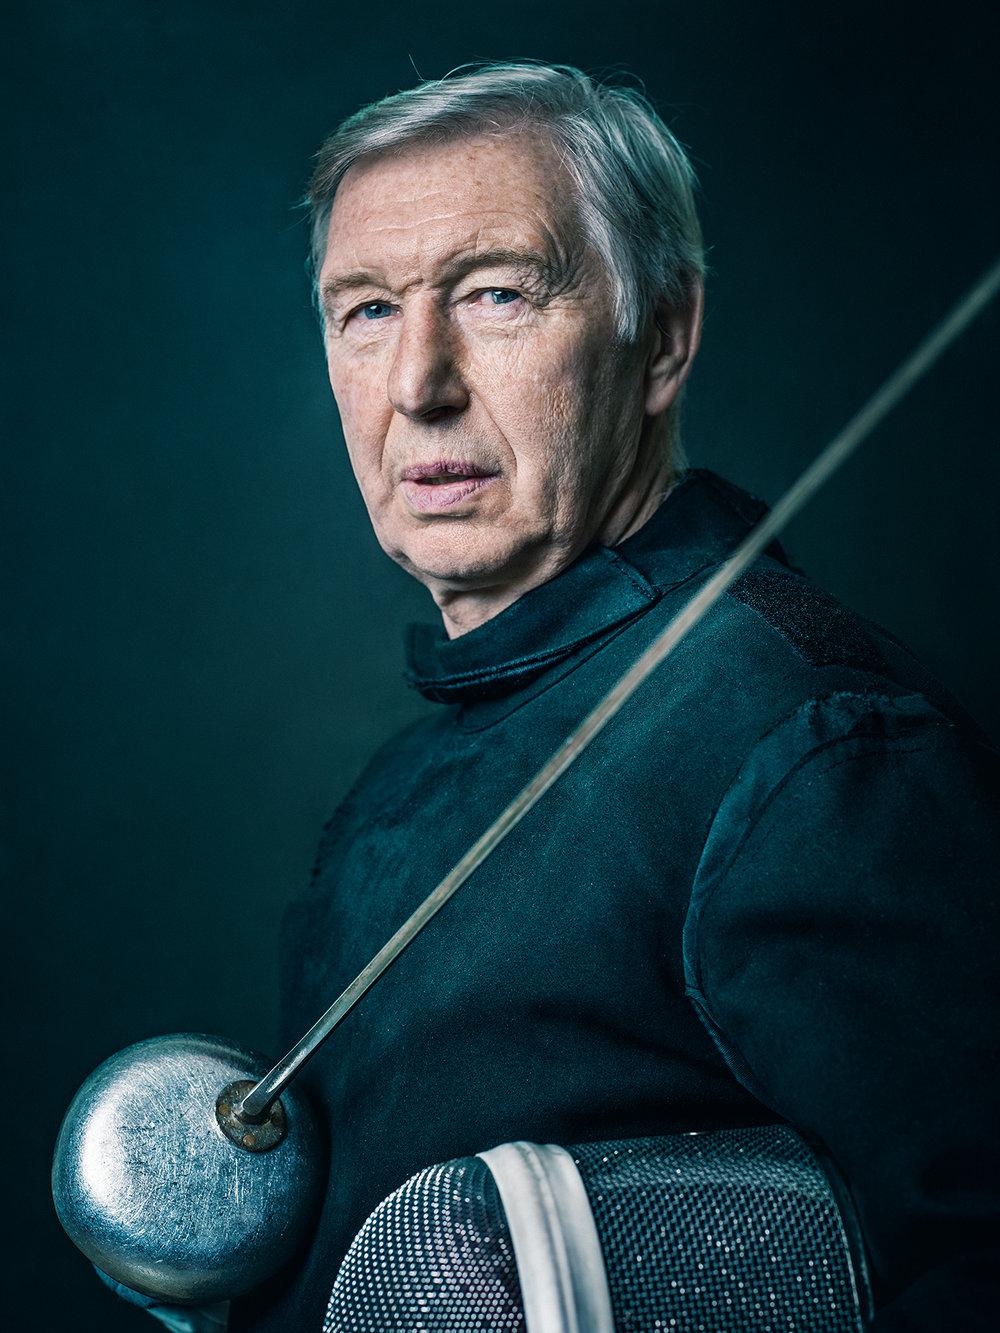 Oscar-arribas-esgrima-maestro-fencing-master-fencer-fechten-scherma-escrime-portrait-fotografo-retrato-photographer011.jpg